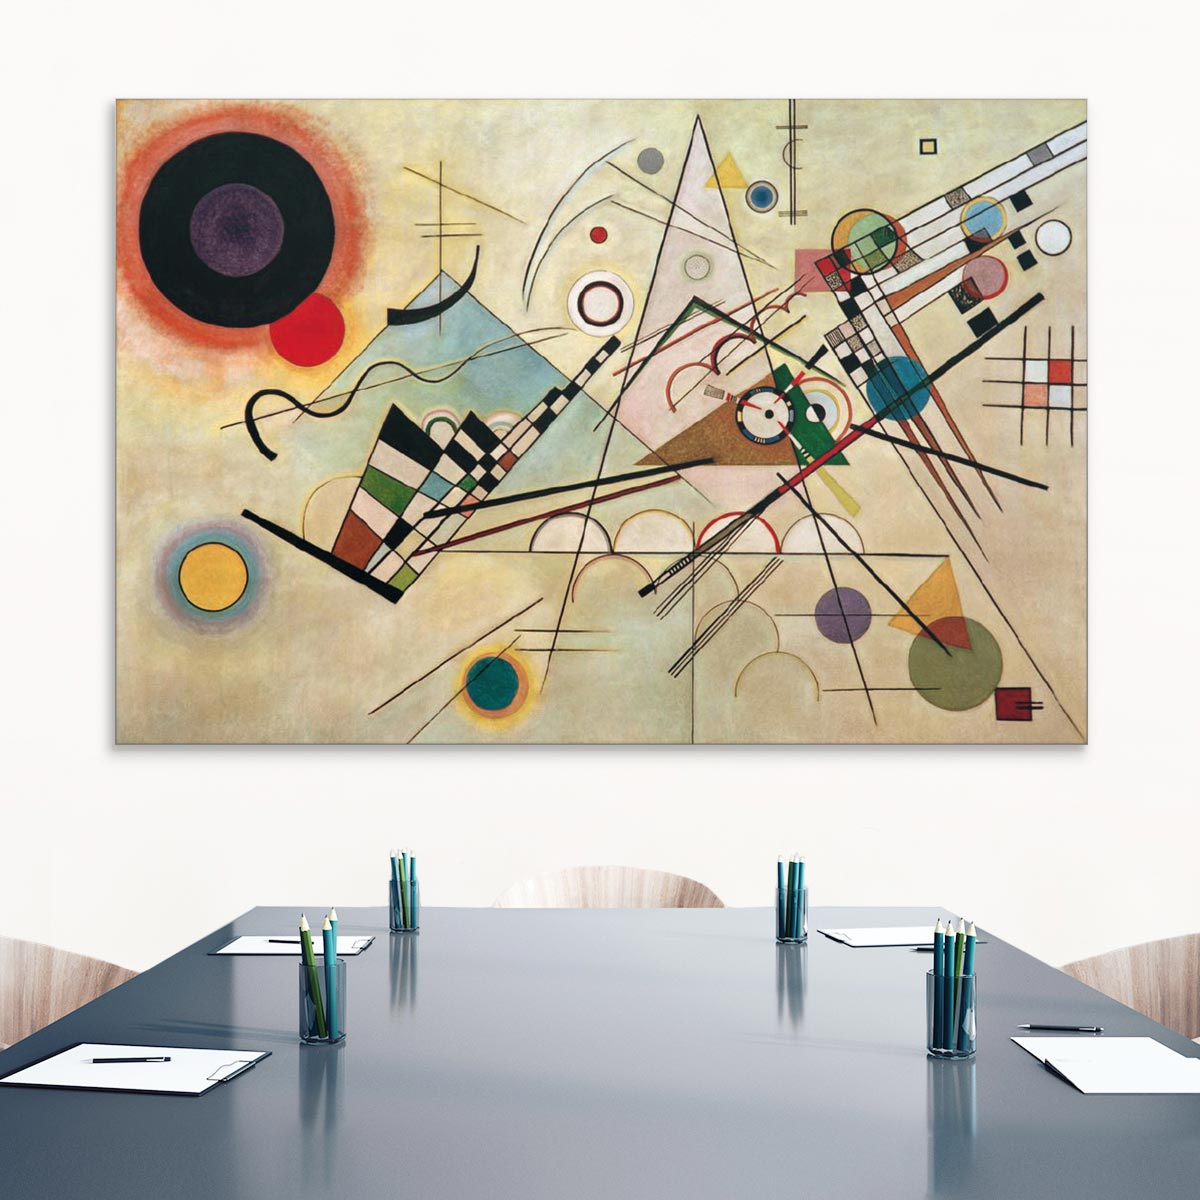 "Akustikbild ""Komposition VIII"", Wassily Kandinsky"